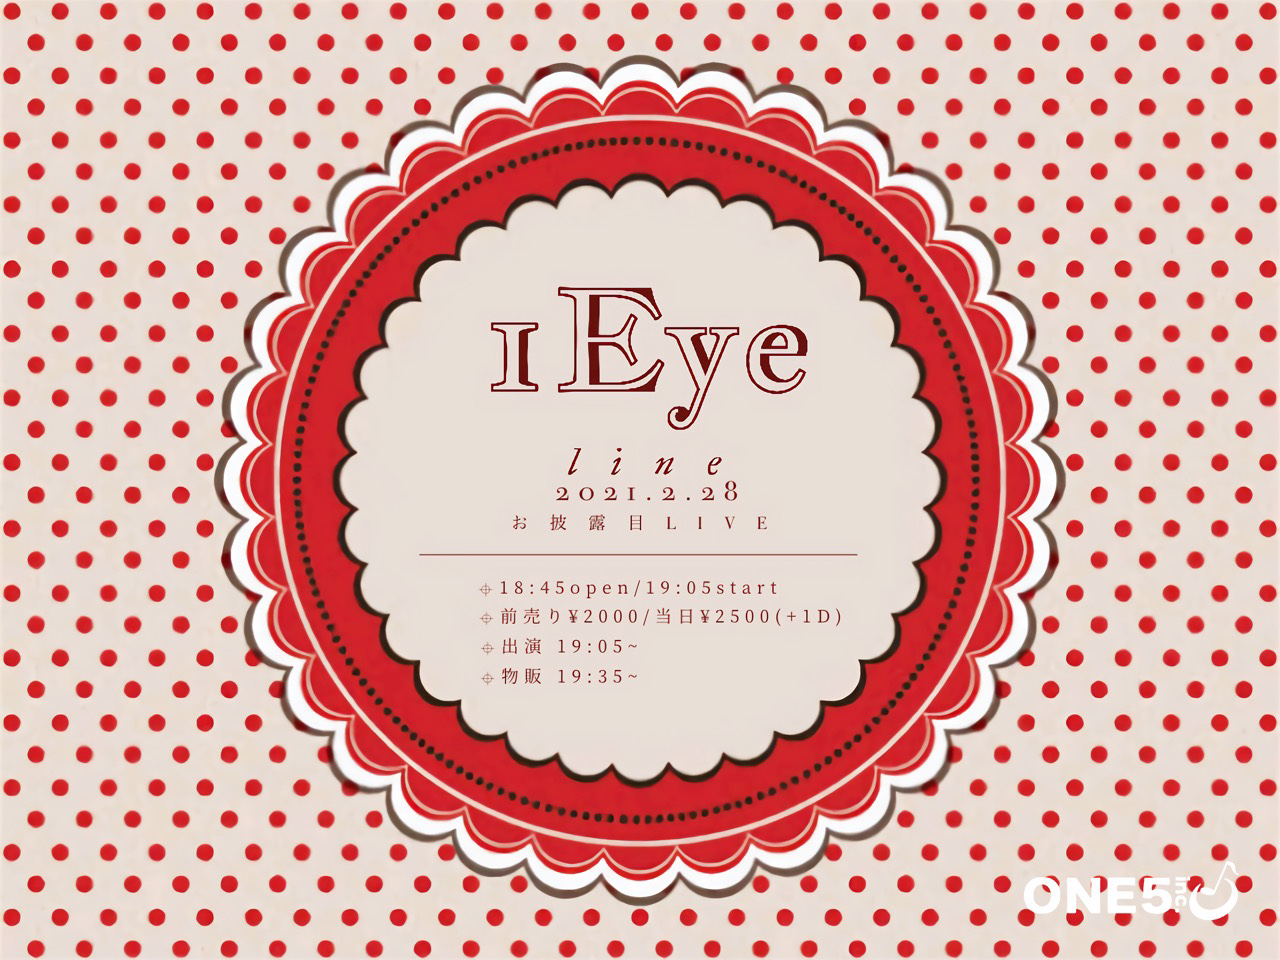 1Eyelineお披露目LIVE